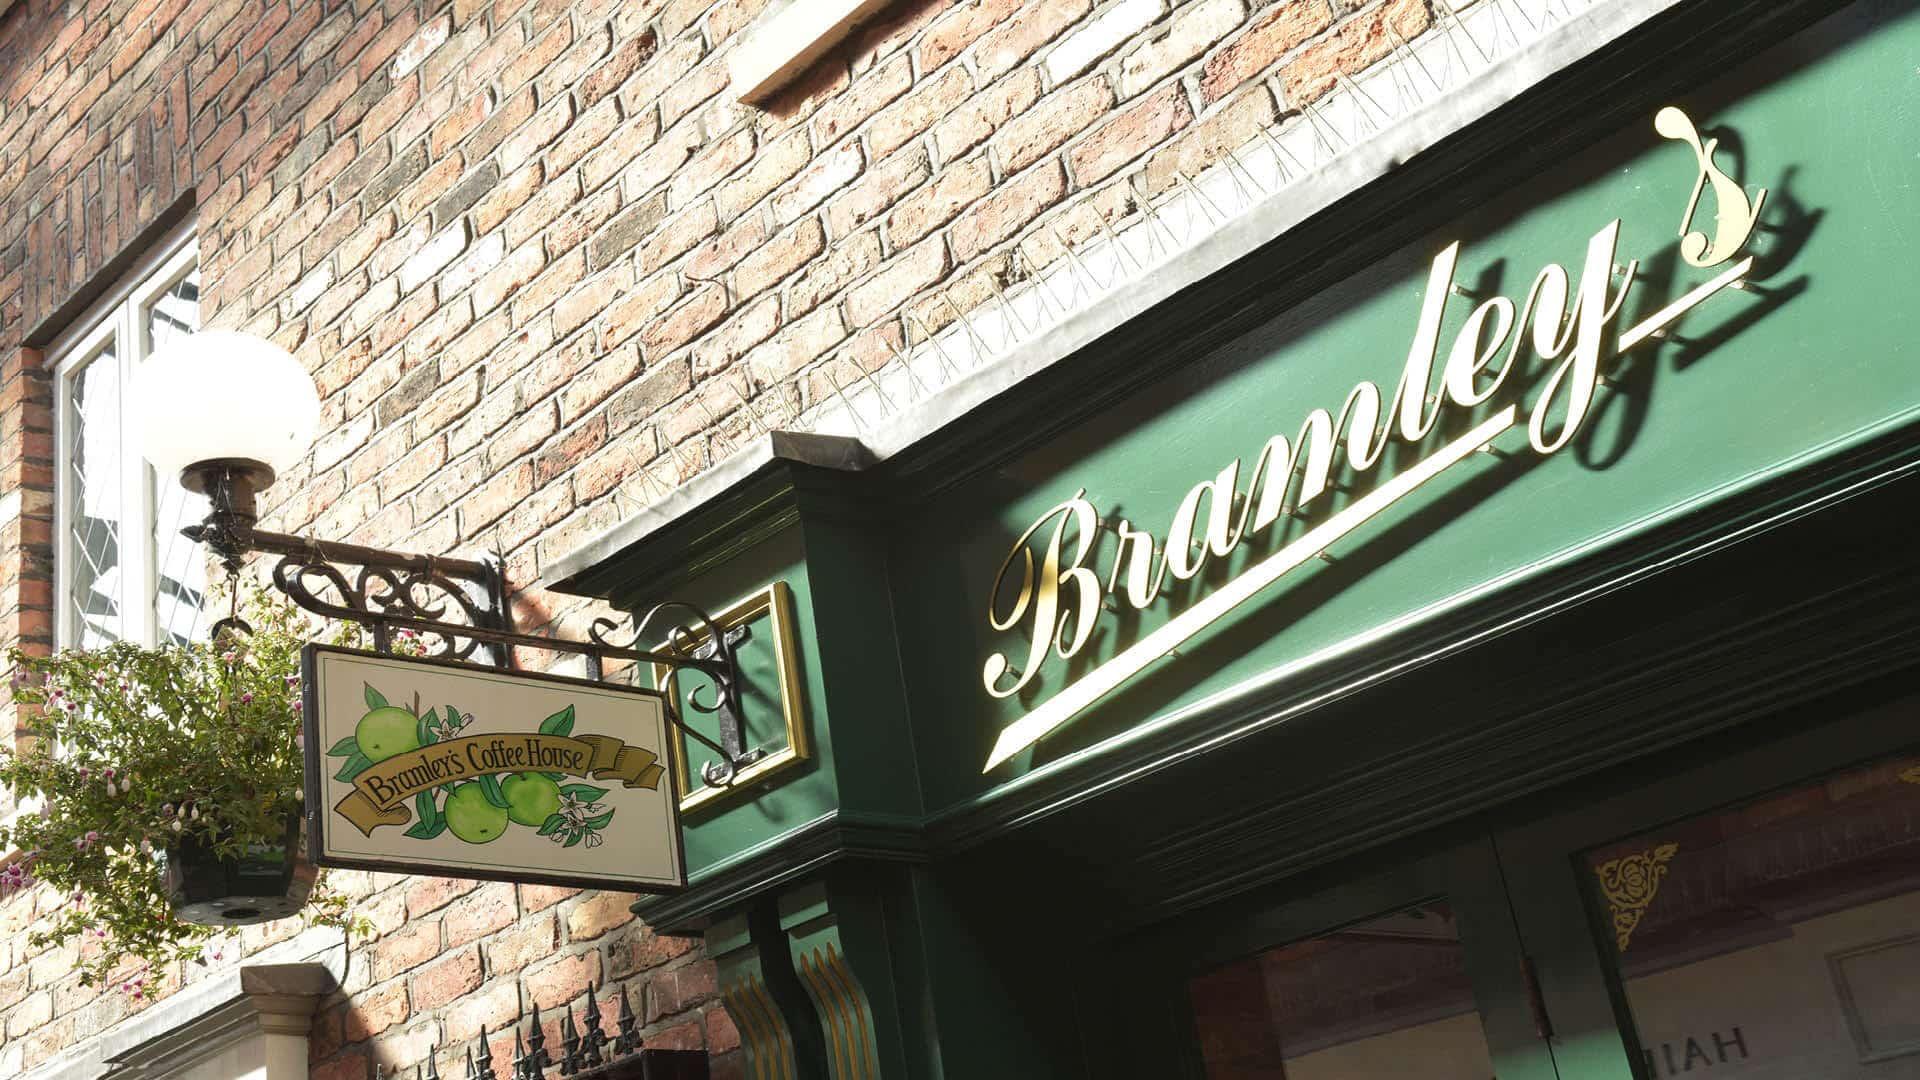 Bramley's Coffee House